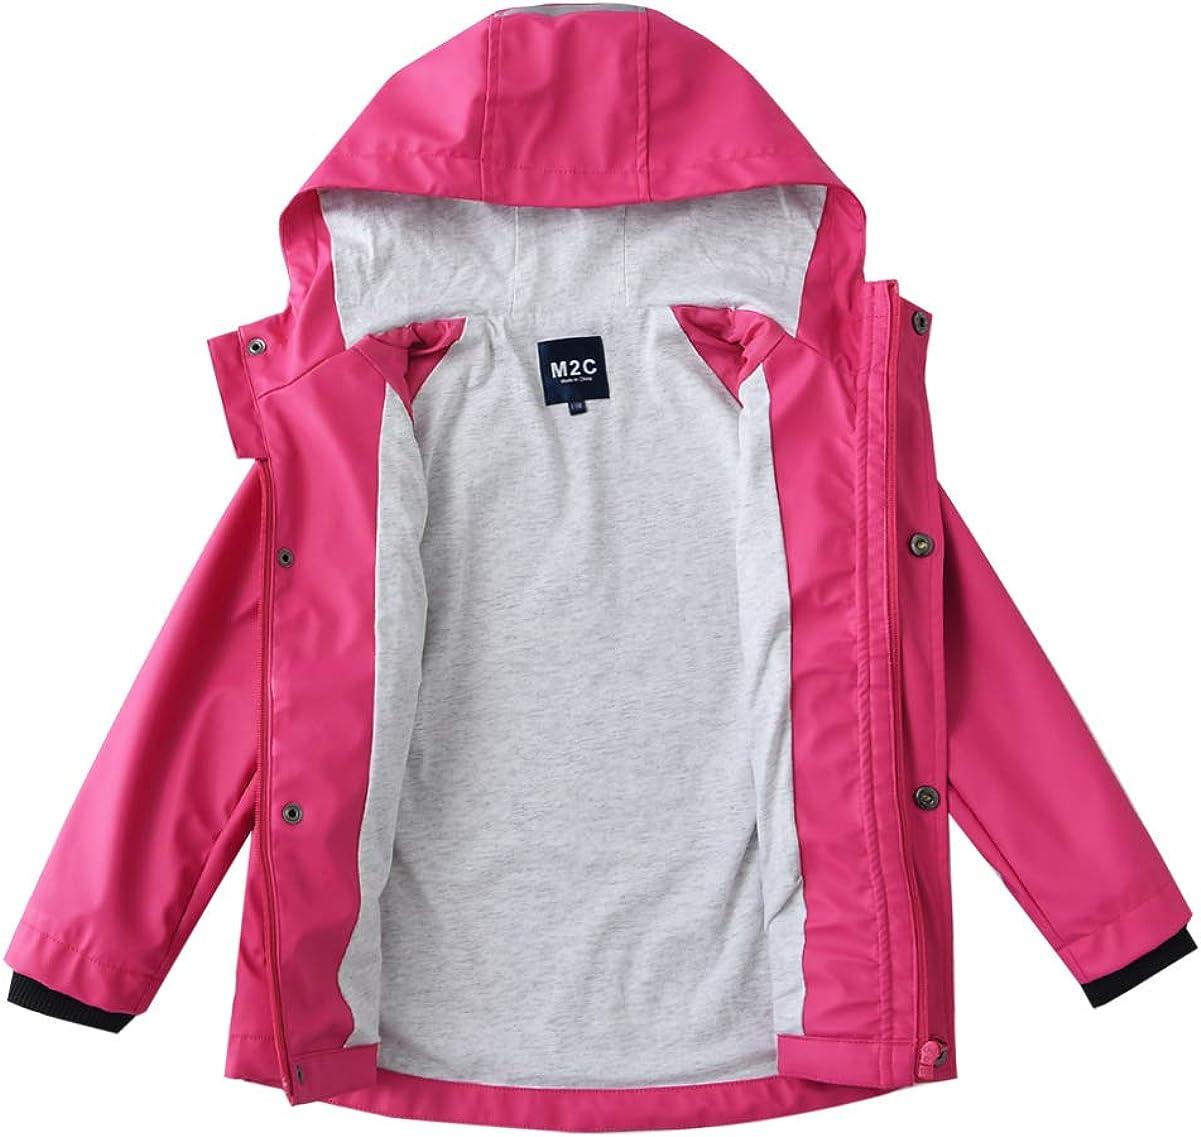 M2C Boys Girls Cotton Lined Waterproof Rain Jacket Hooded Windproof Raincoat